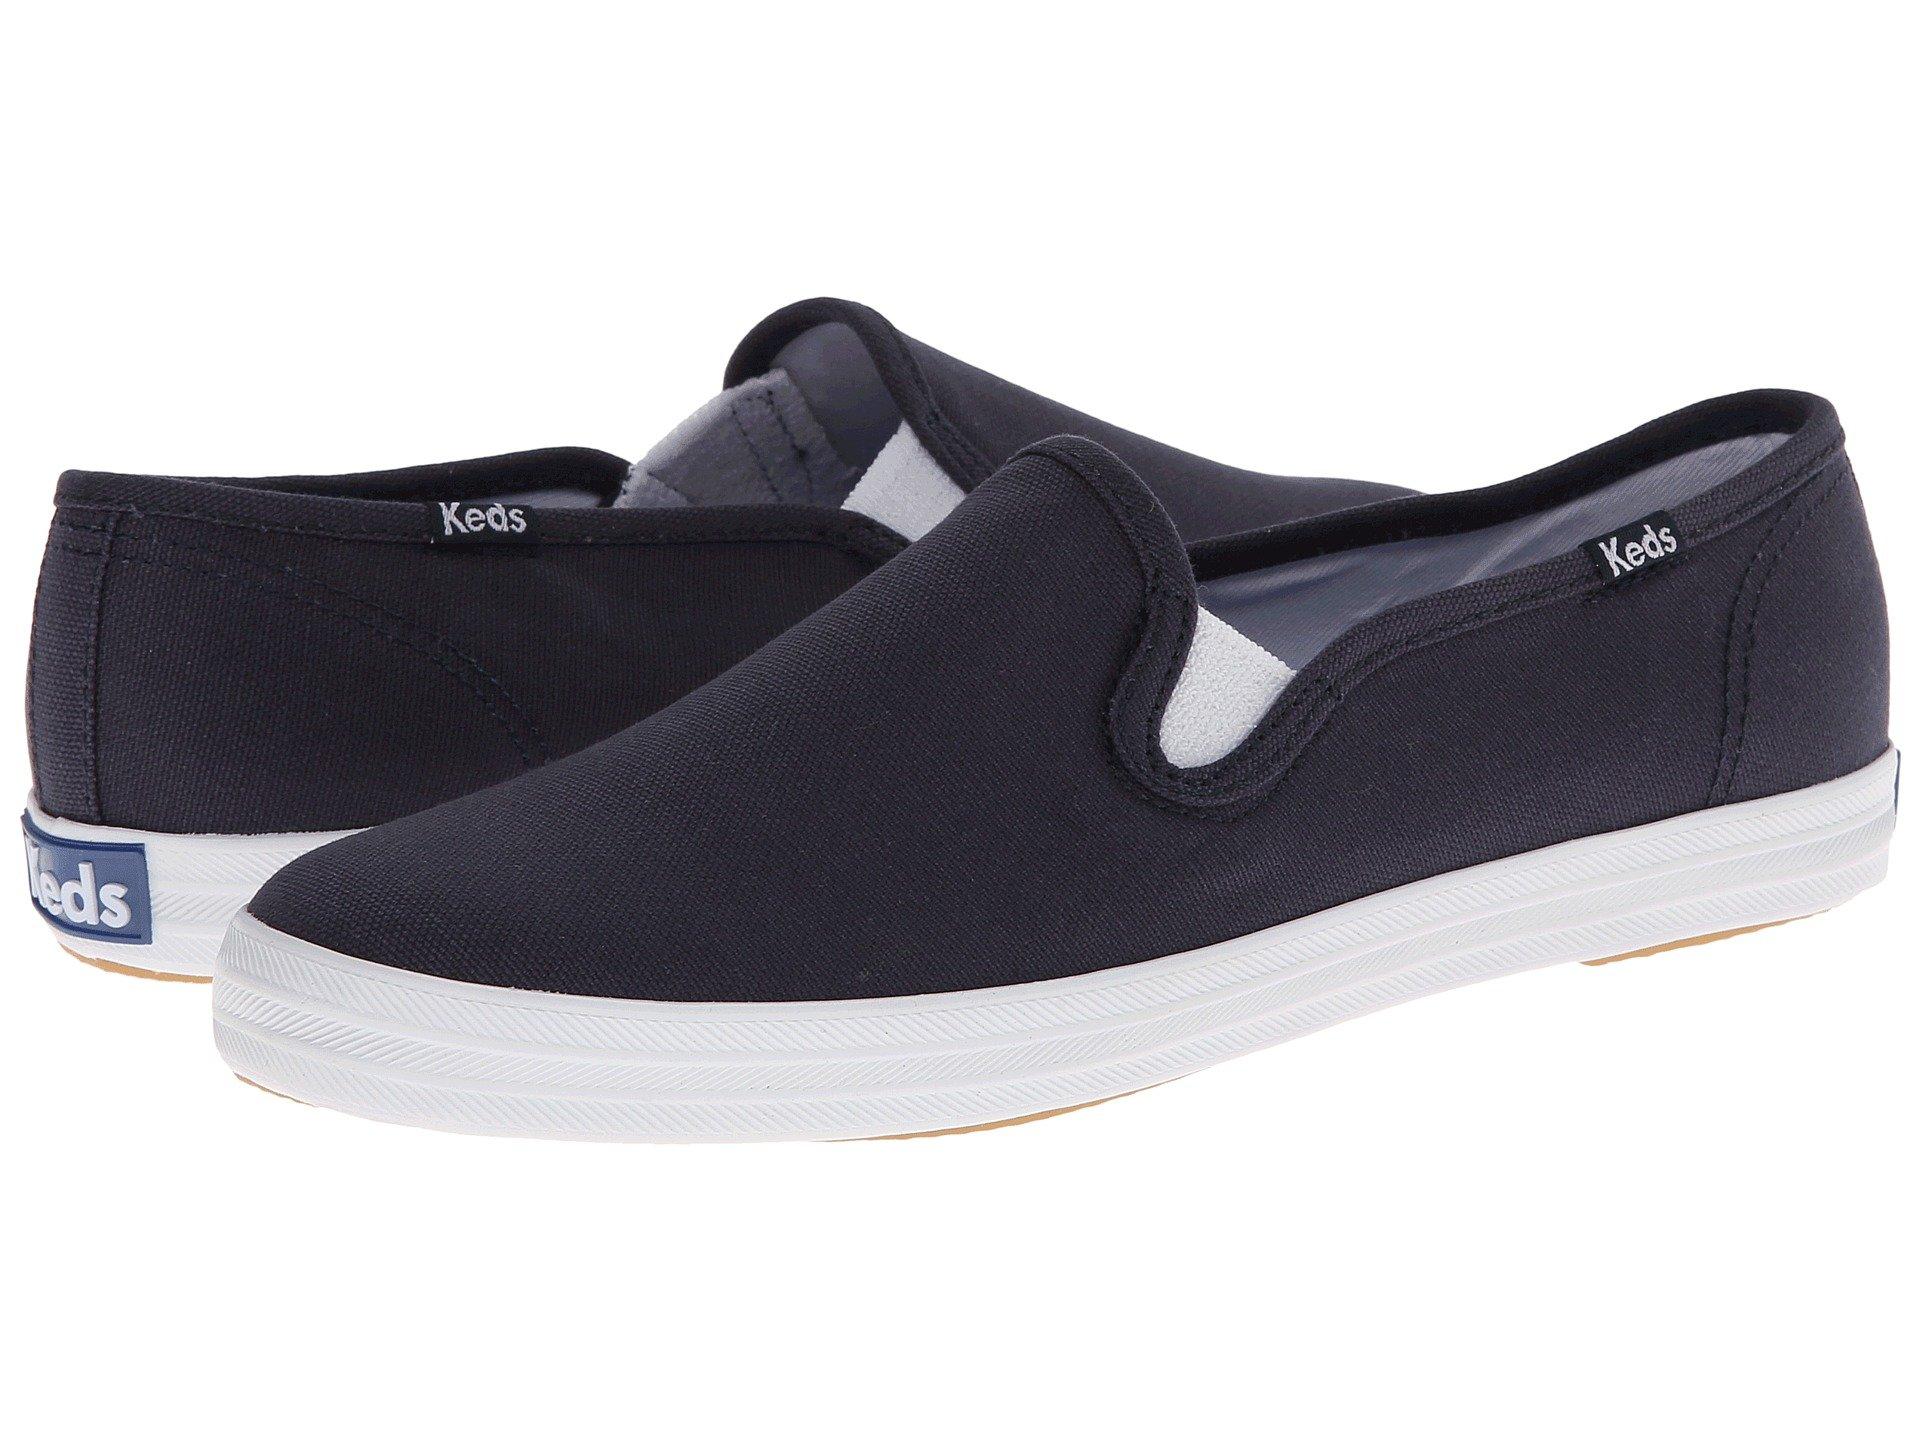 Keds White Slip On Shoes